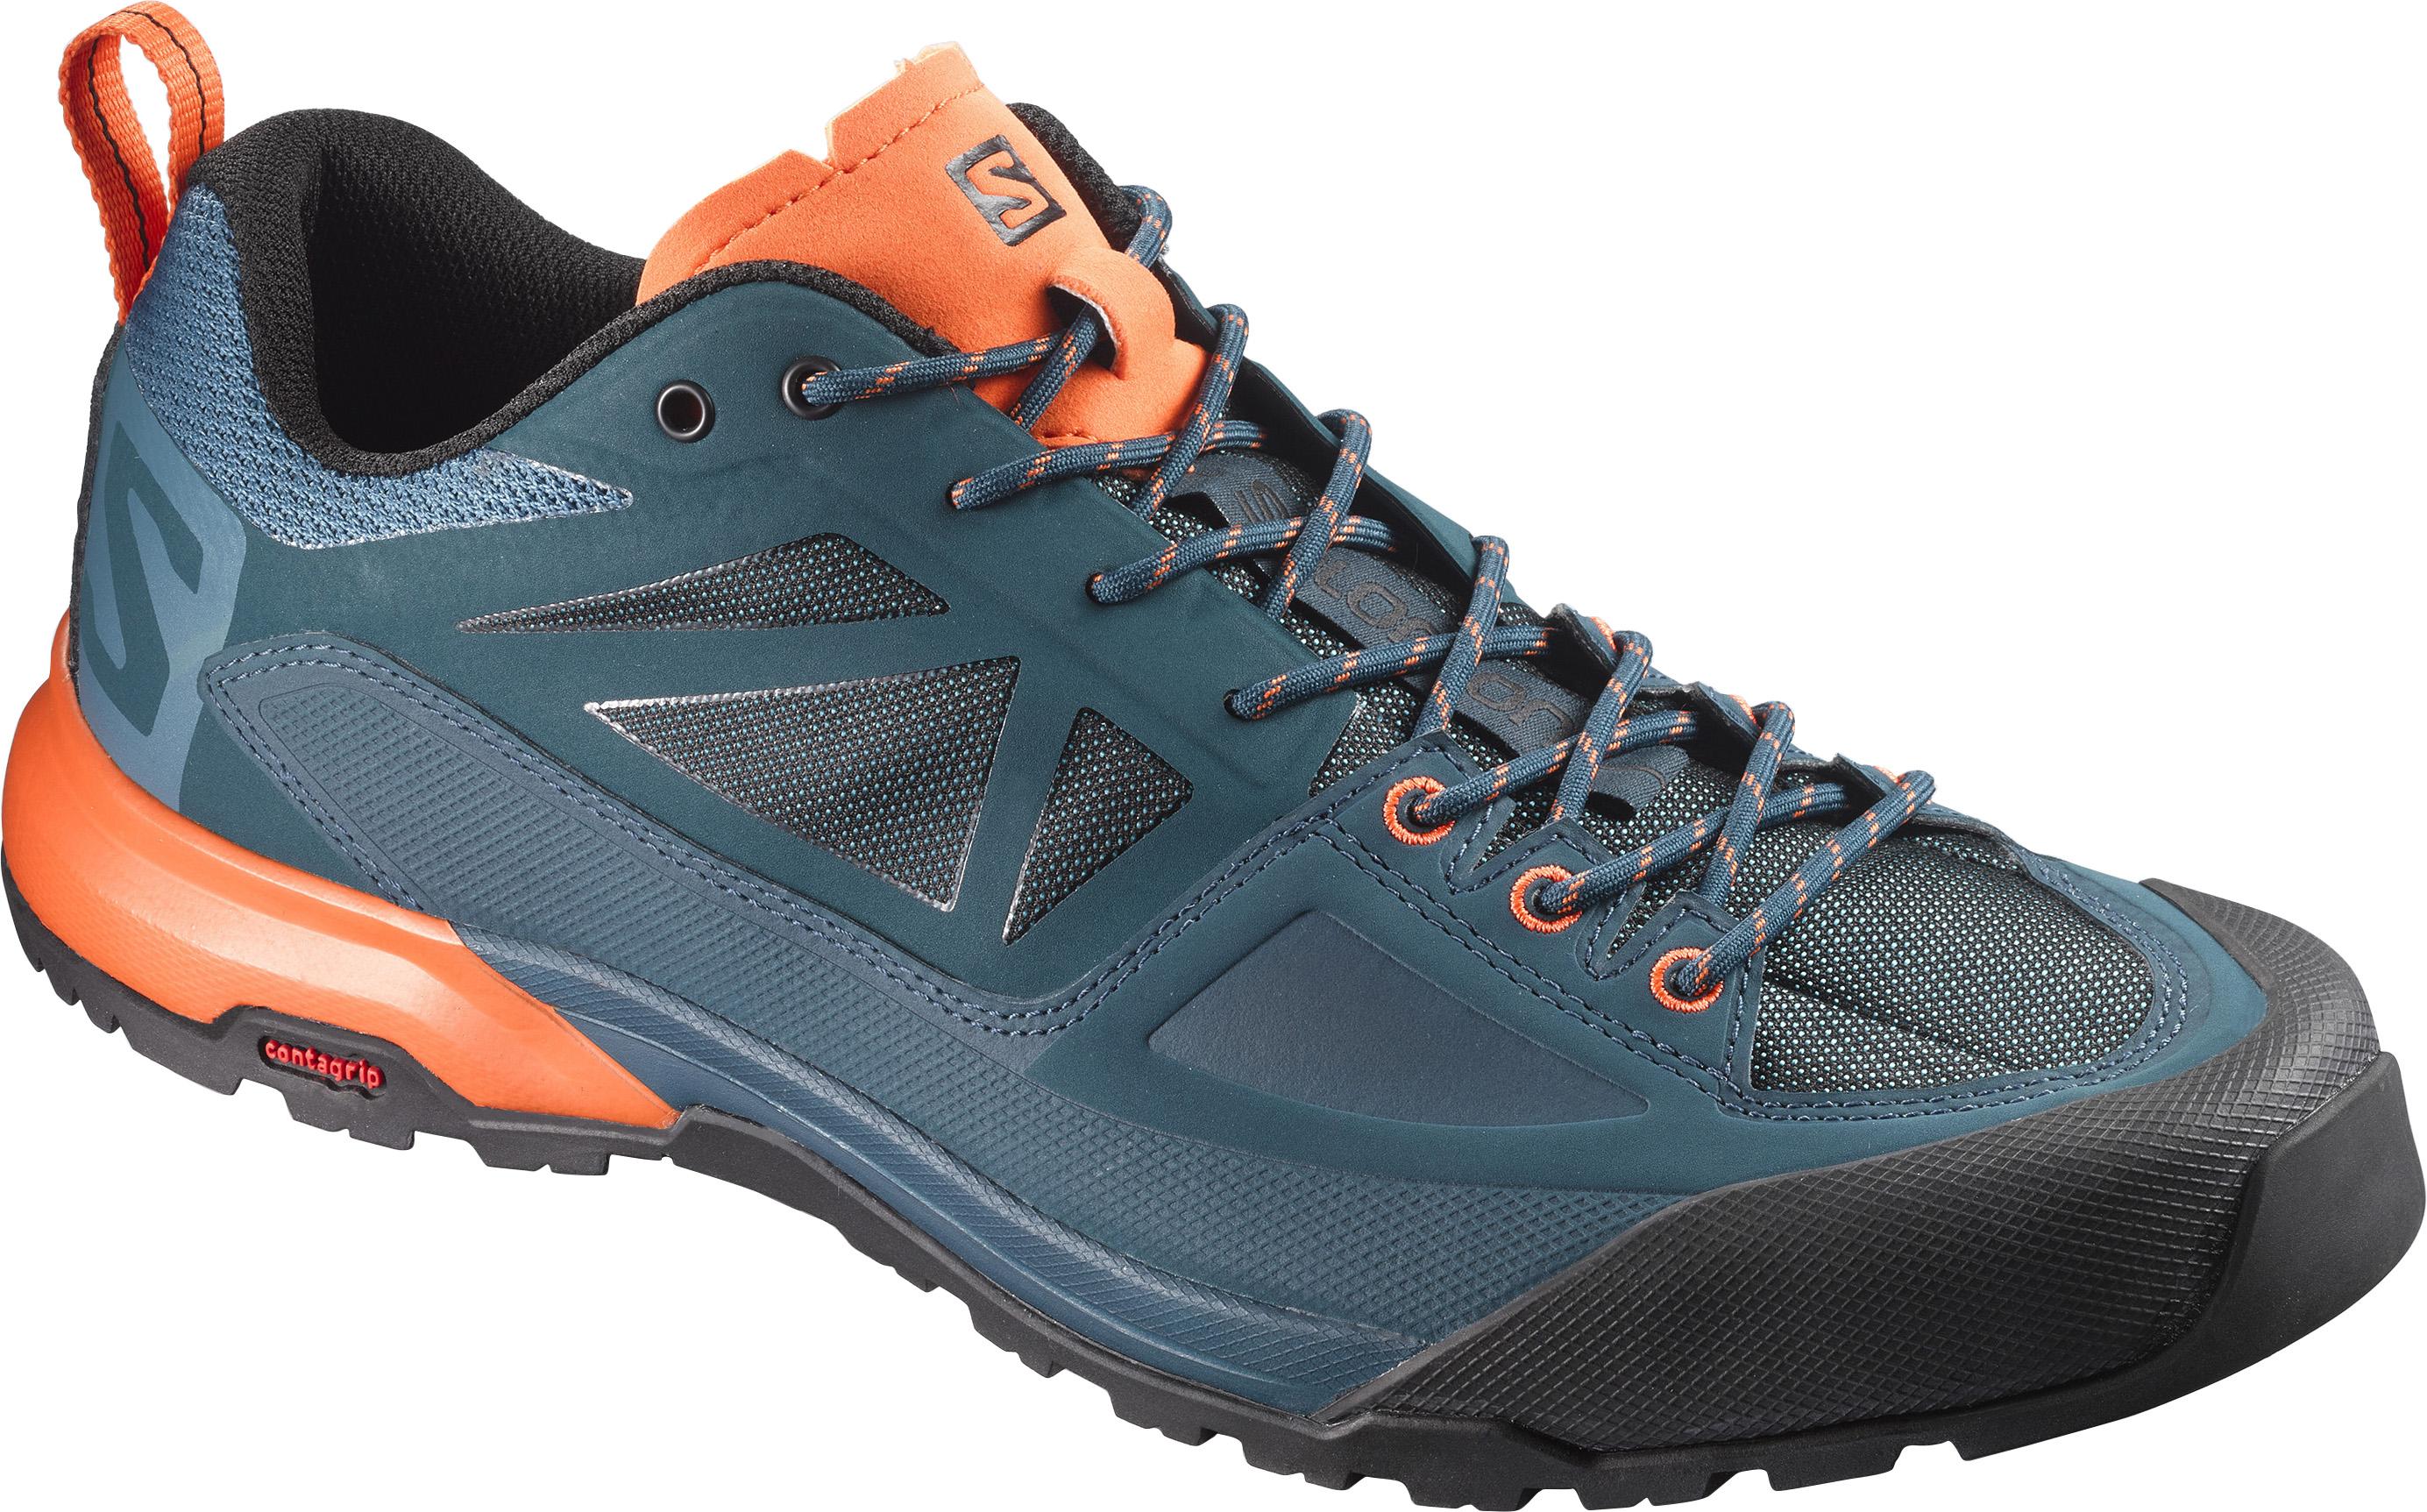 38cf997fad Salomon X Alp Spry Approach Shoe - Men's